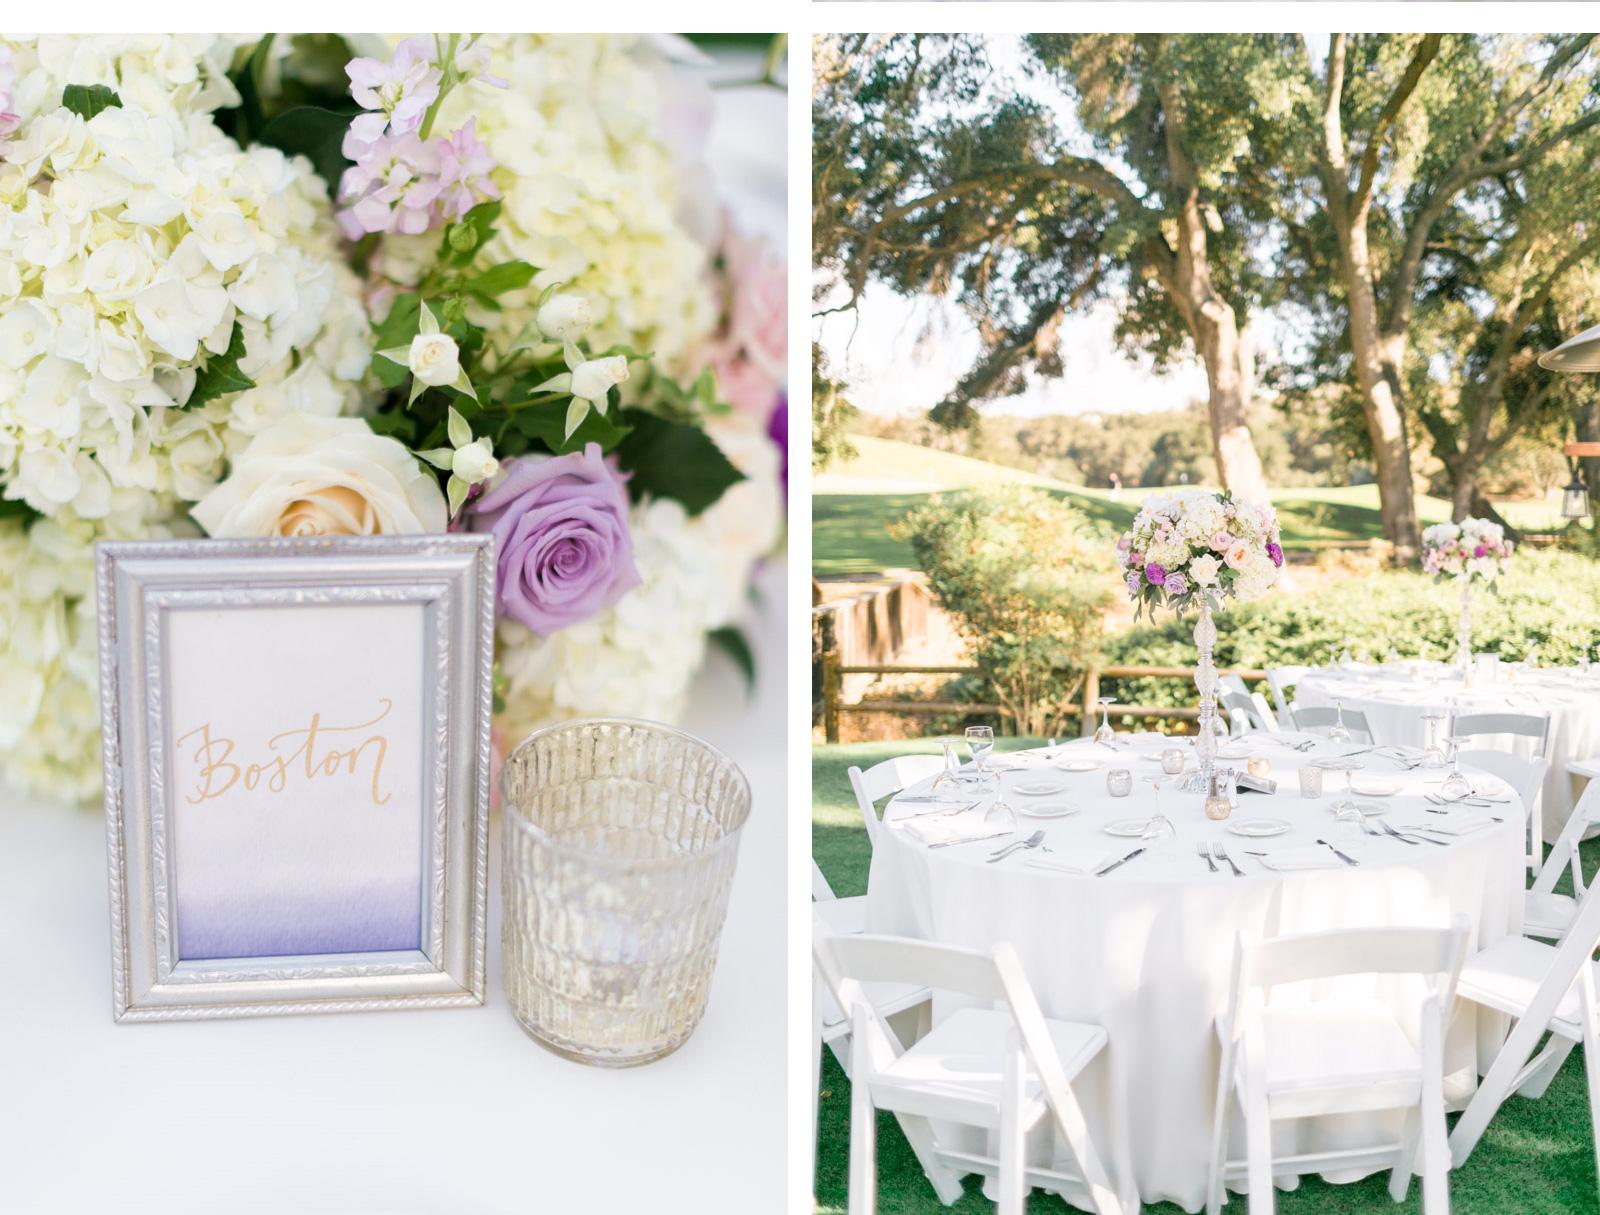 Nia-Sanchez-Southern-California-Wedding-Natalie-Schutt-Photography_08.jpg